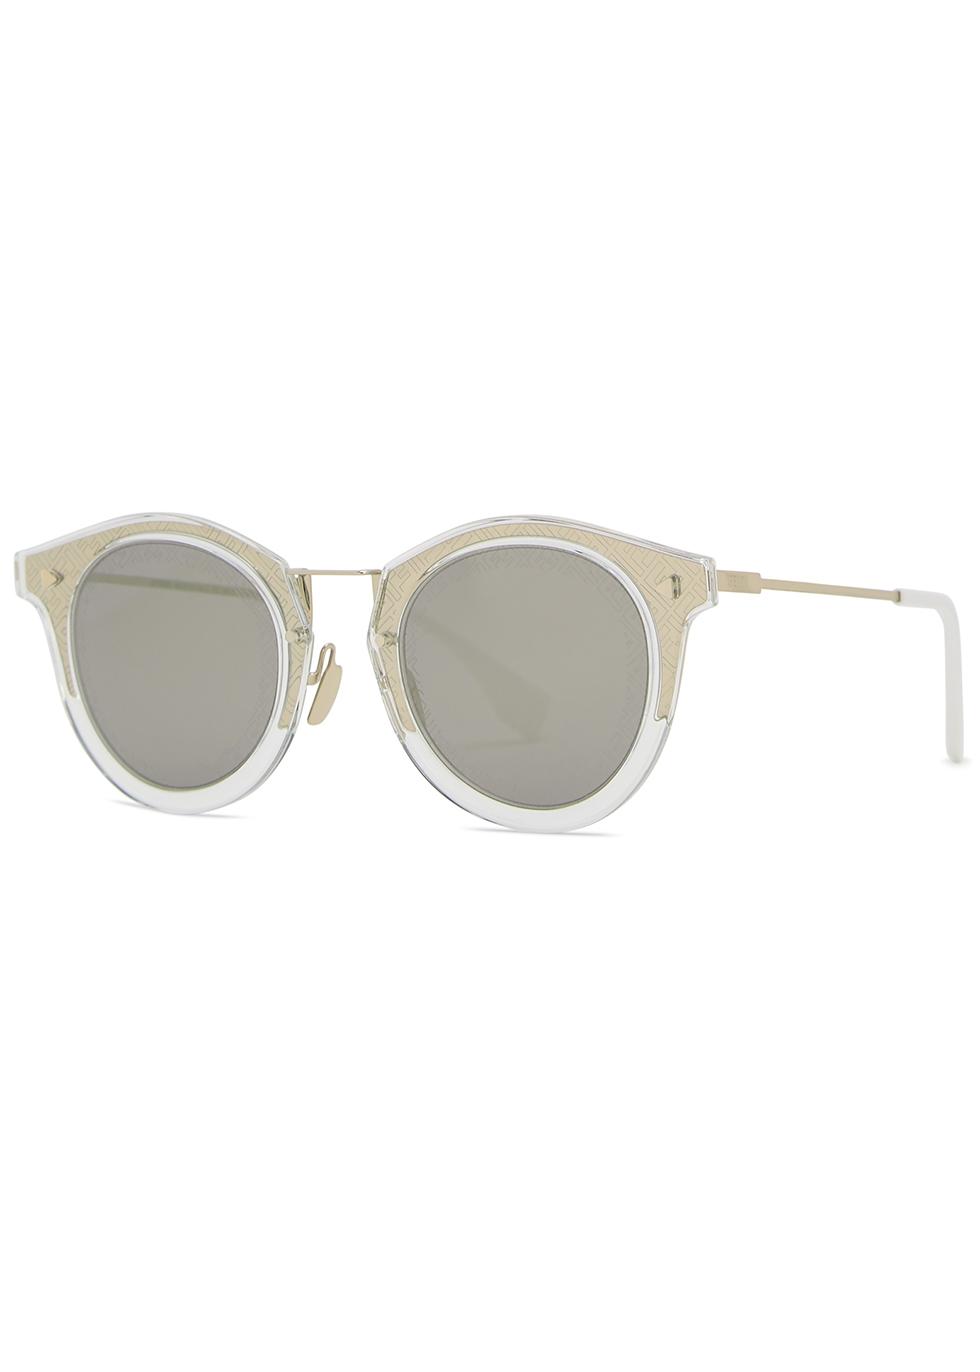 Gold-tone oval-frame sunglasses - Fendi